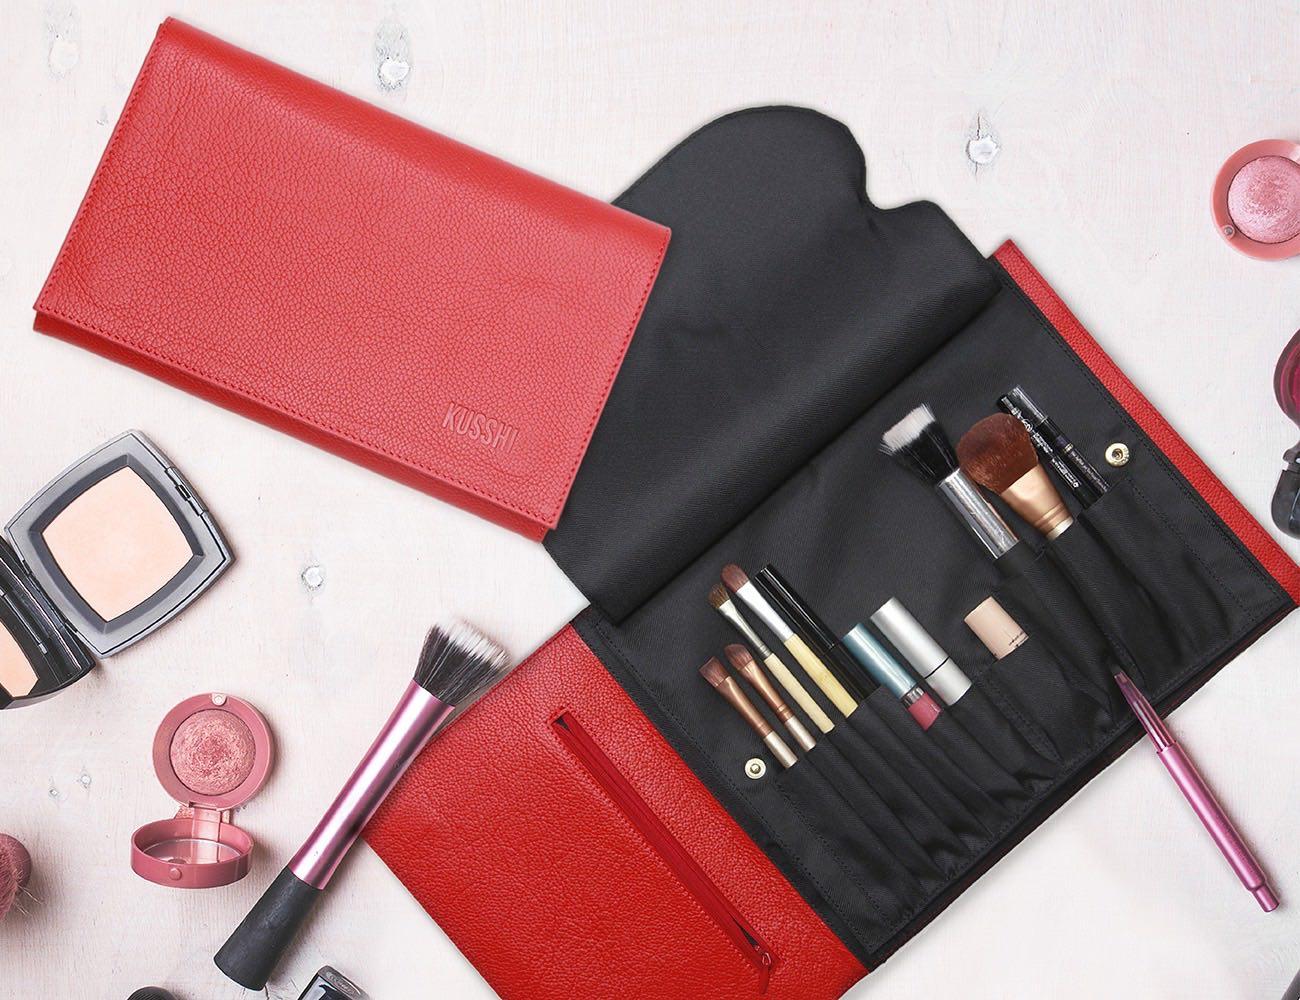 Kusshi – The Ultimate Makeup Bag